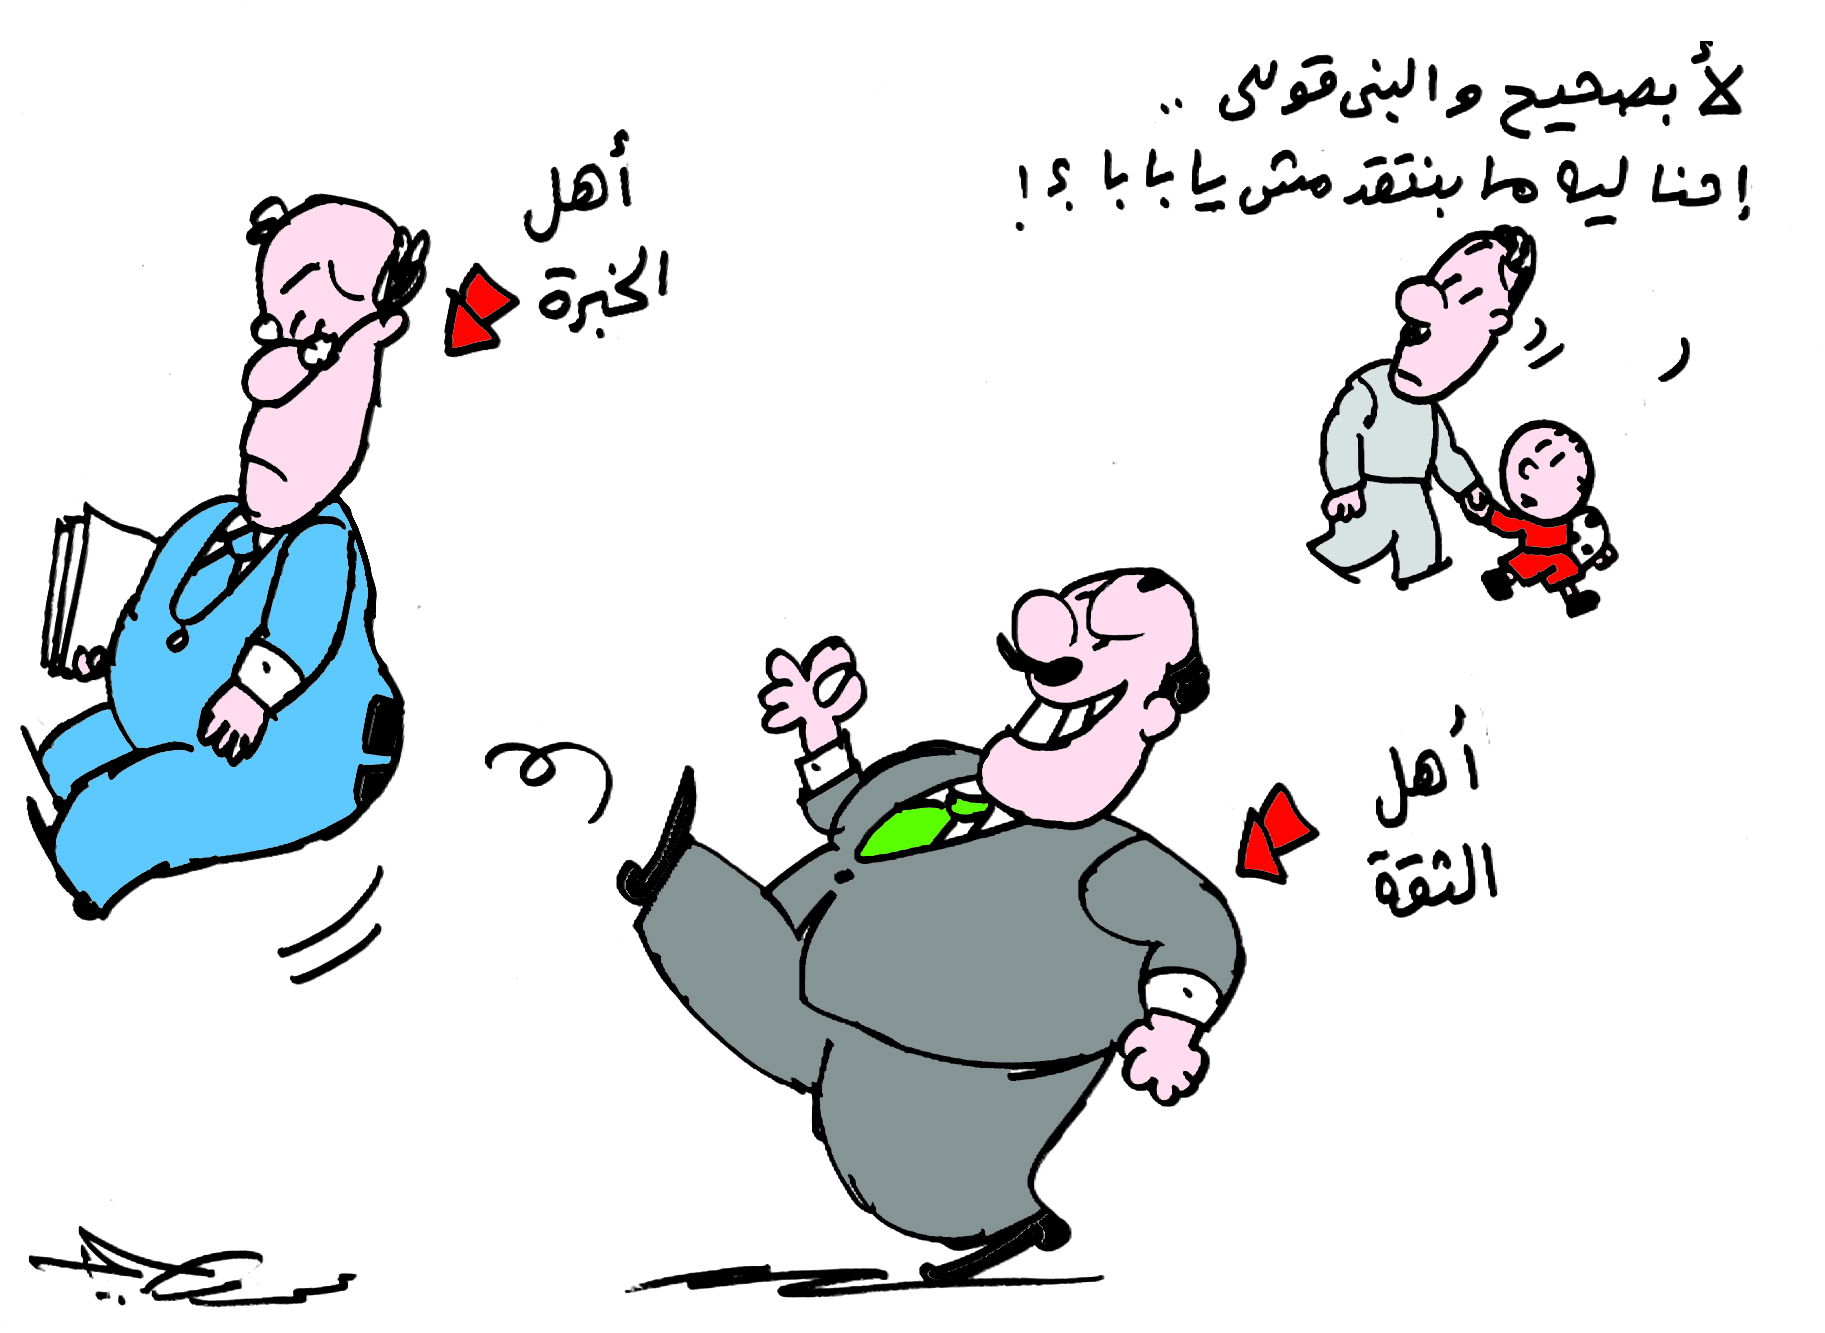 http://www.qalamrsas.com/wp-content/uploads/2017/03/caricatures_1408896253.jpg